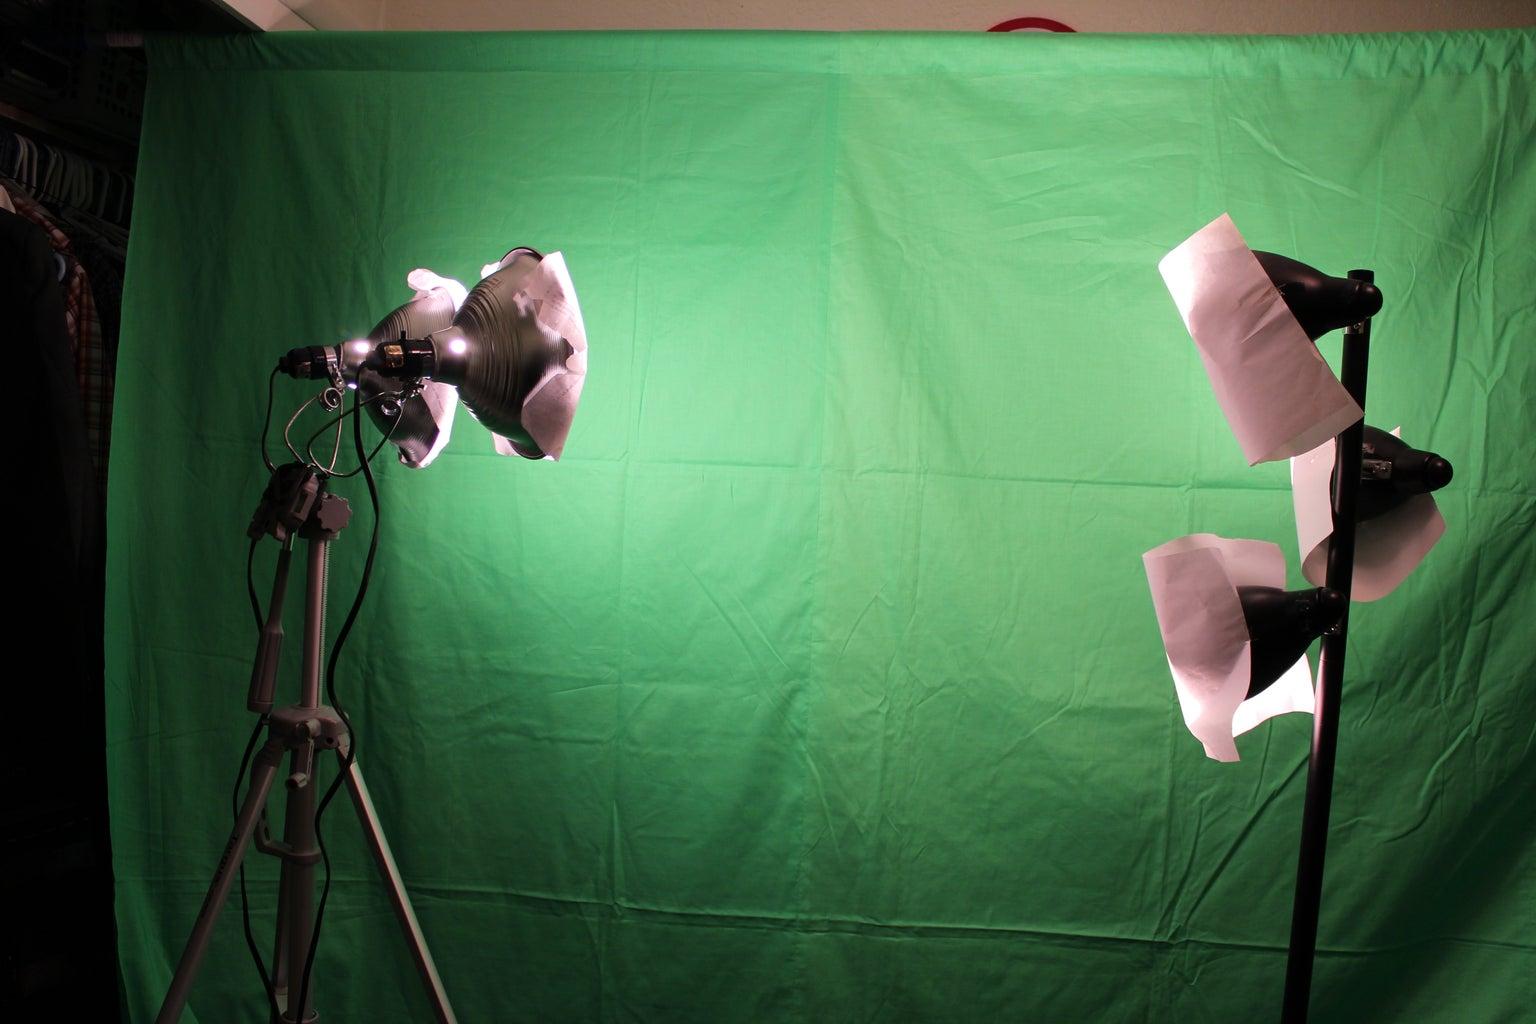 Lighting the Green Screen